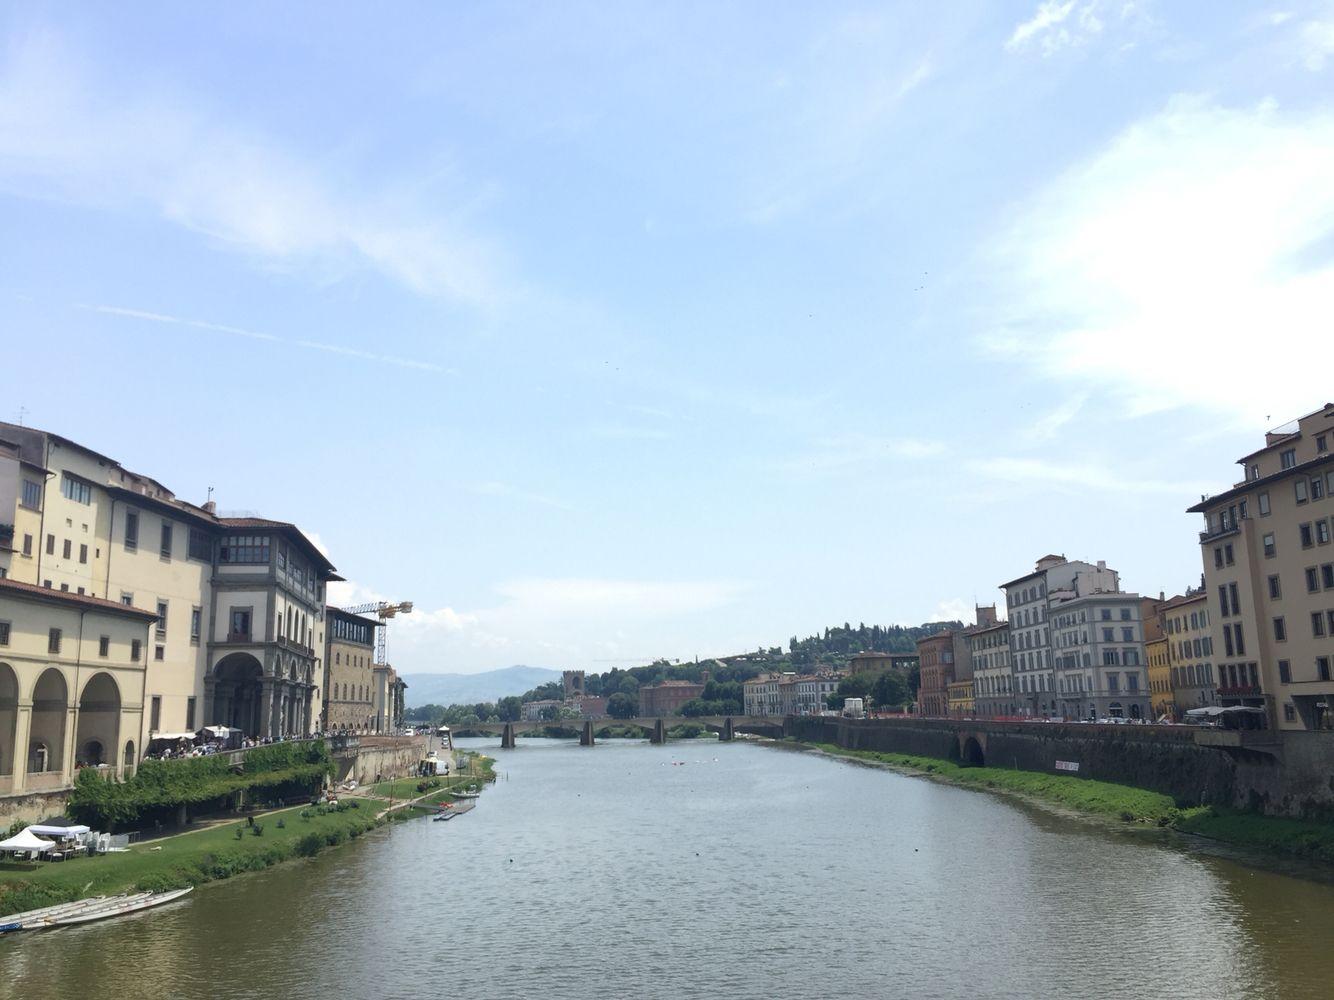 Italian Honeymoon - Day 4 - Firenze - On the Ponte Vecchio ...